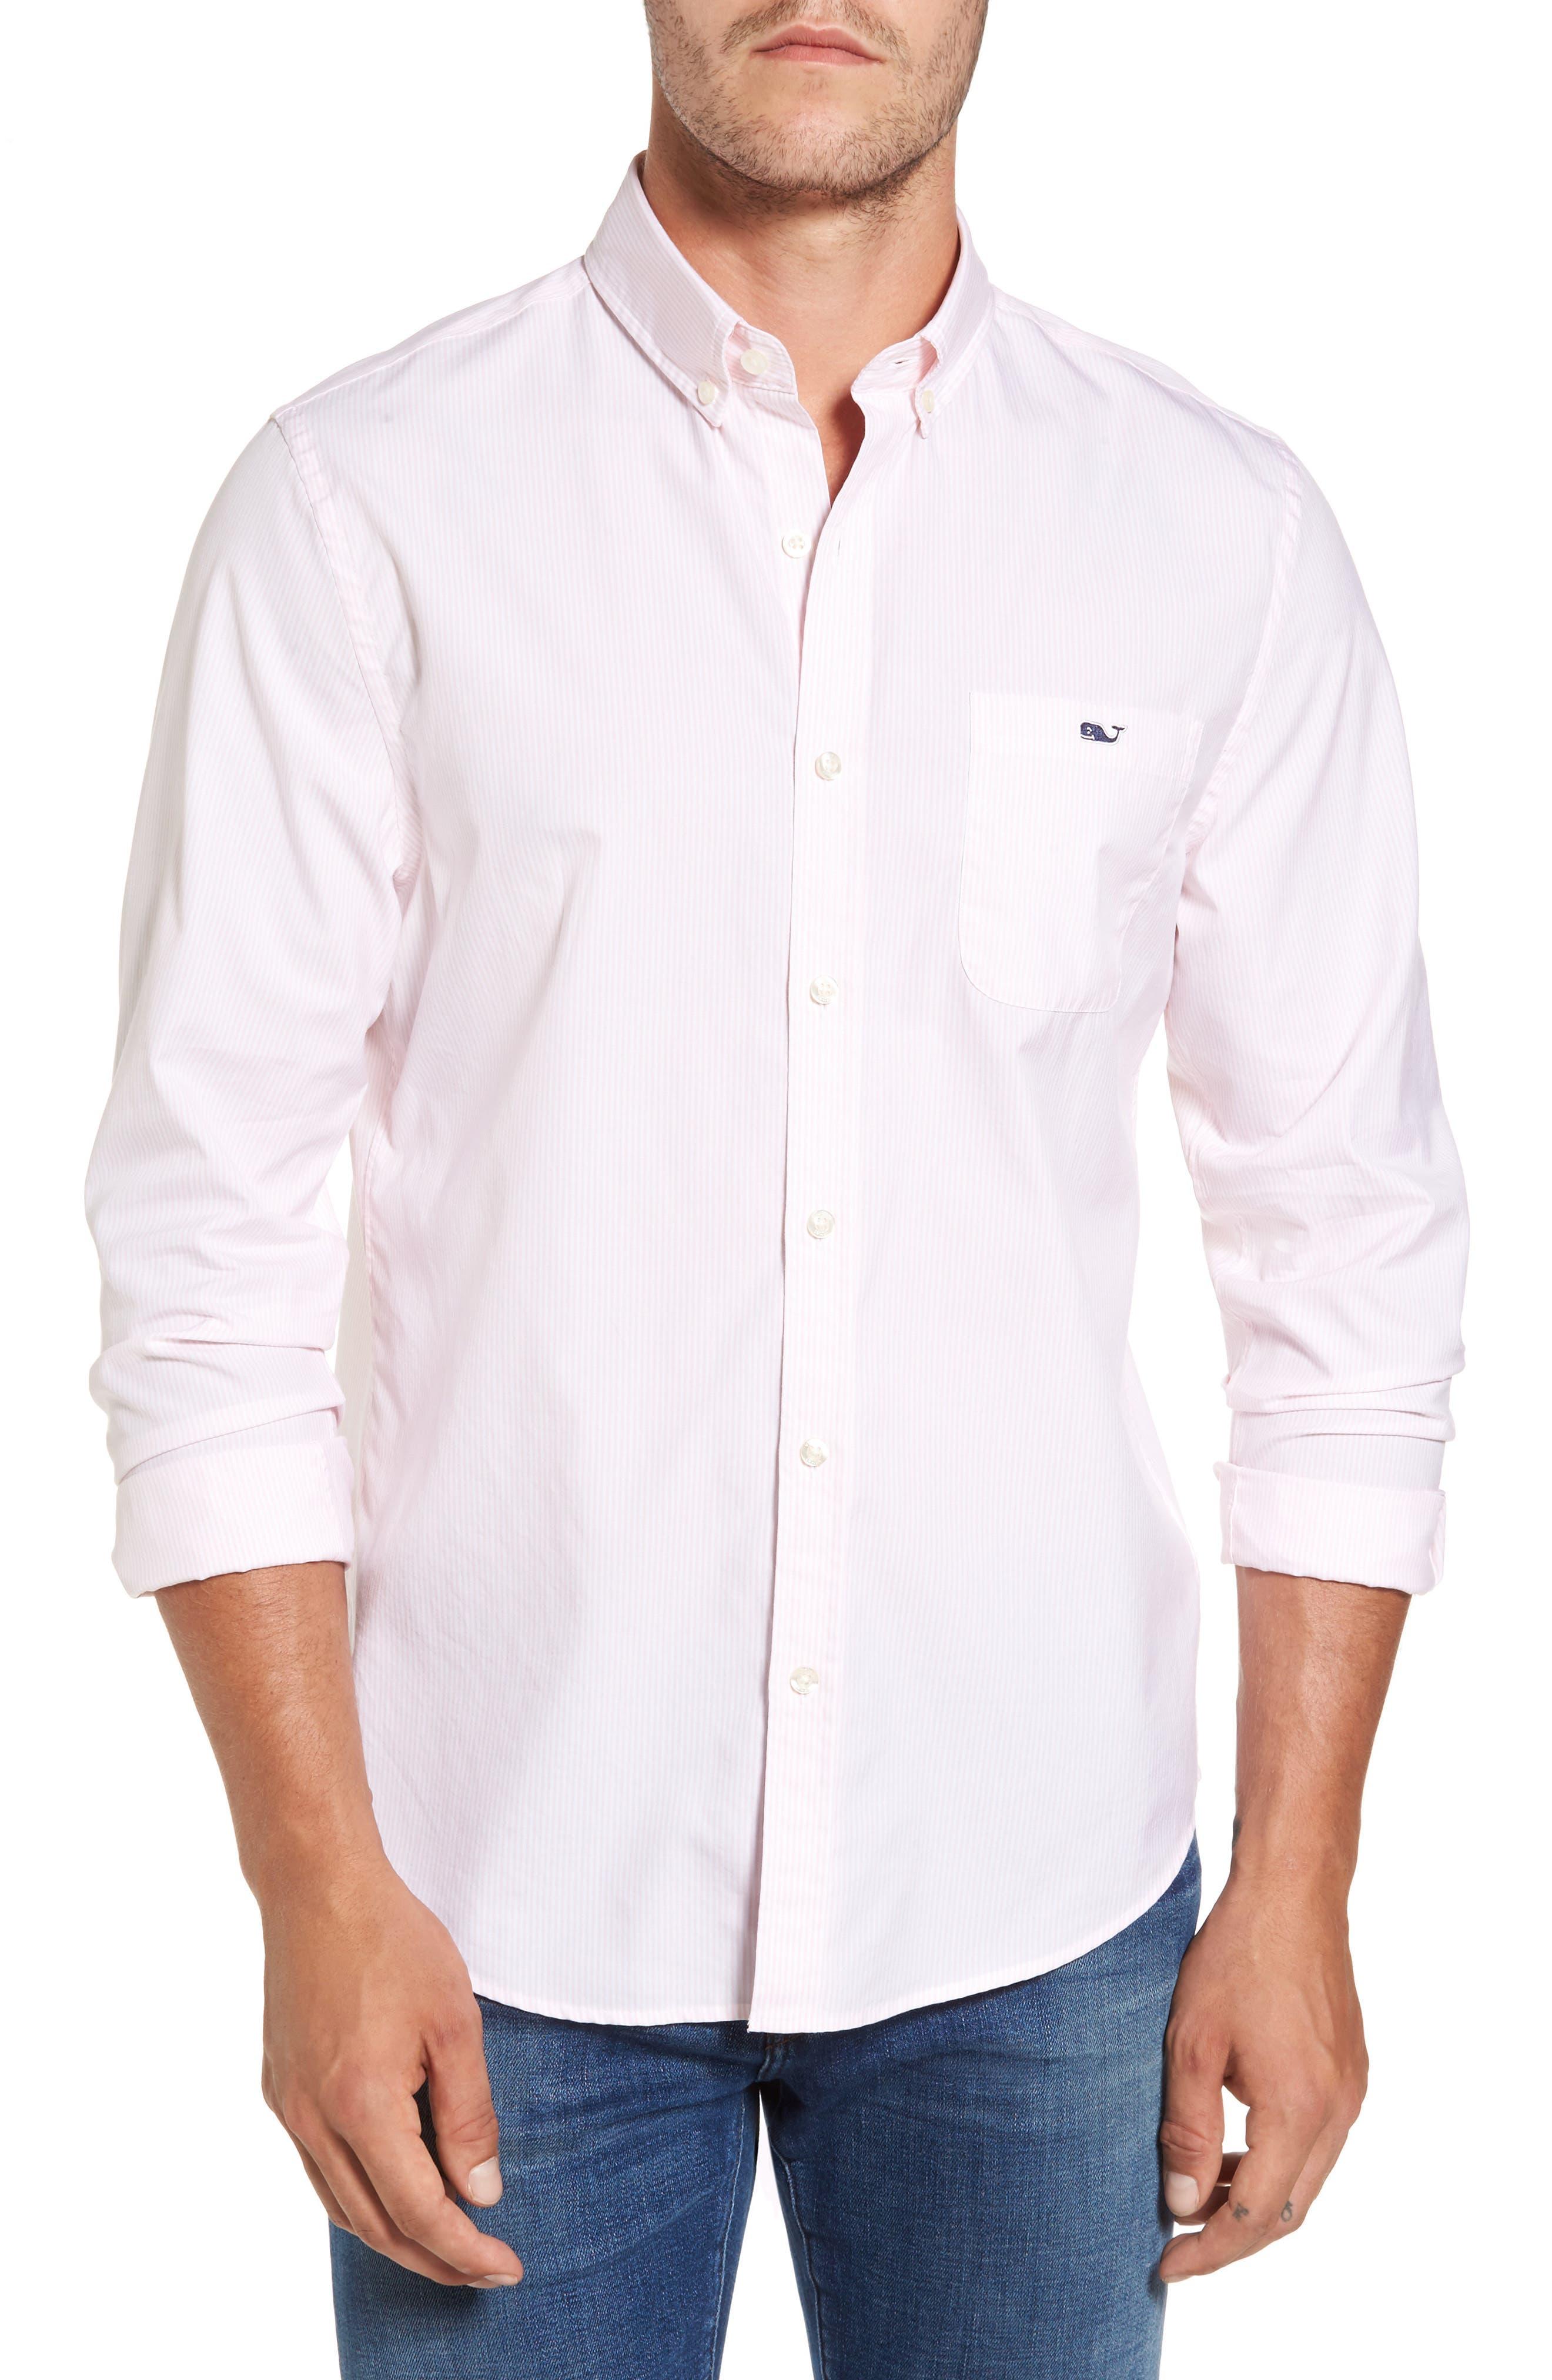 Alternate Image 1 Selected - vineyard vines Seabird Stripe Tucker Slim Fit Sport Shirt